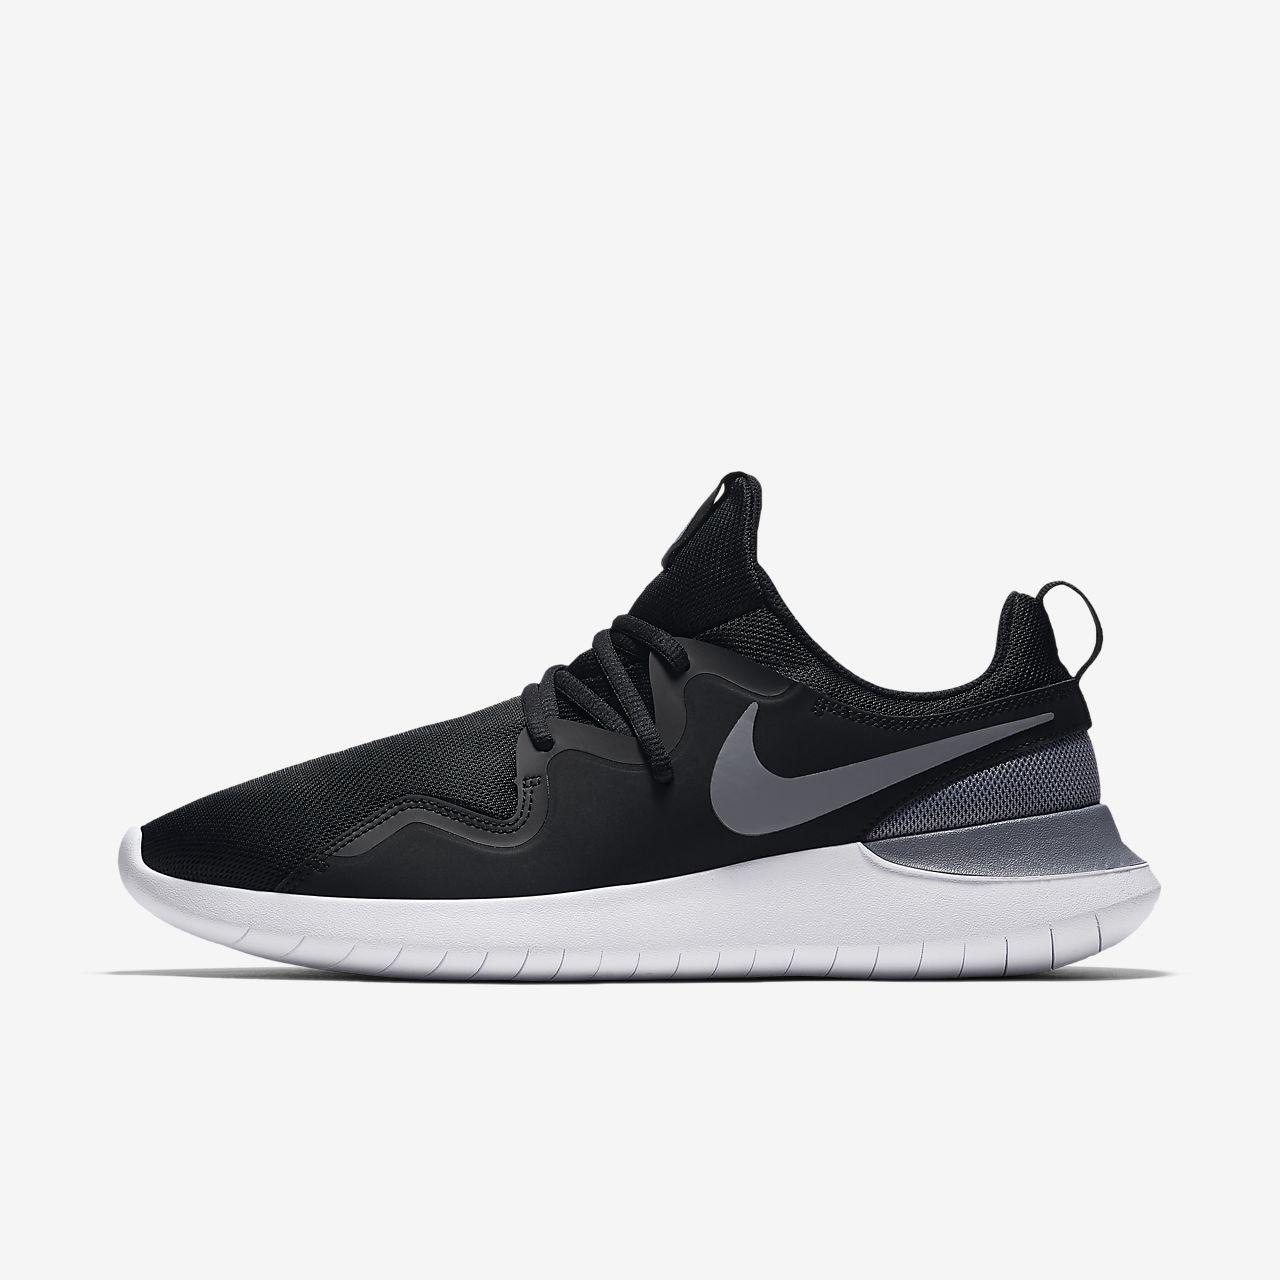 NIKE/耐克 TESSEN 黑白缓震柔软弯曲男跑步运动鞋 AA2160-001